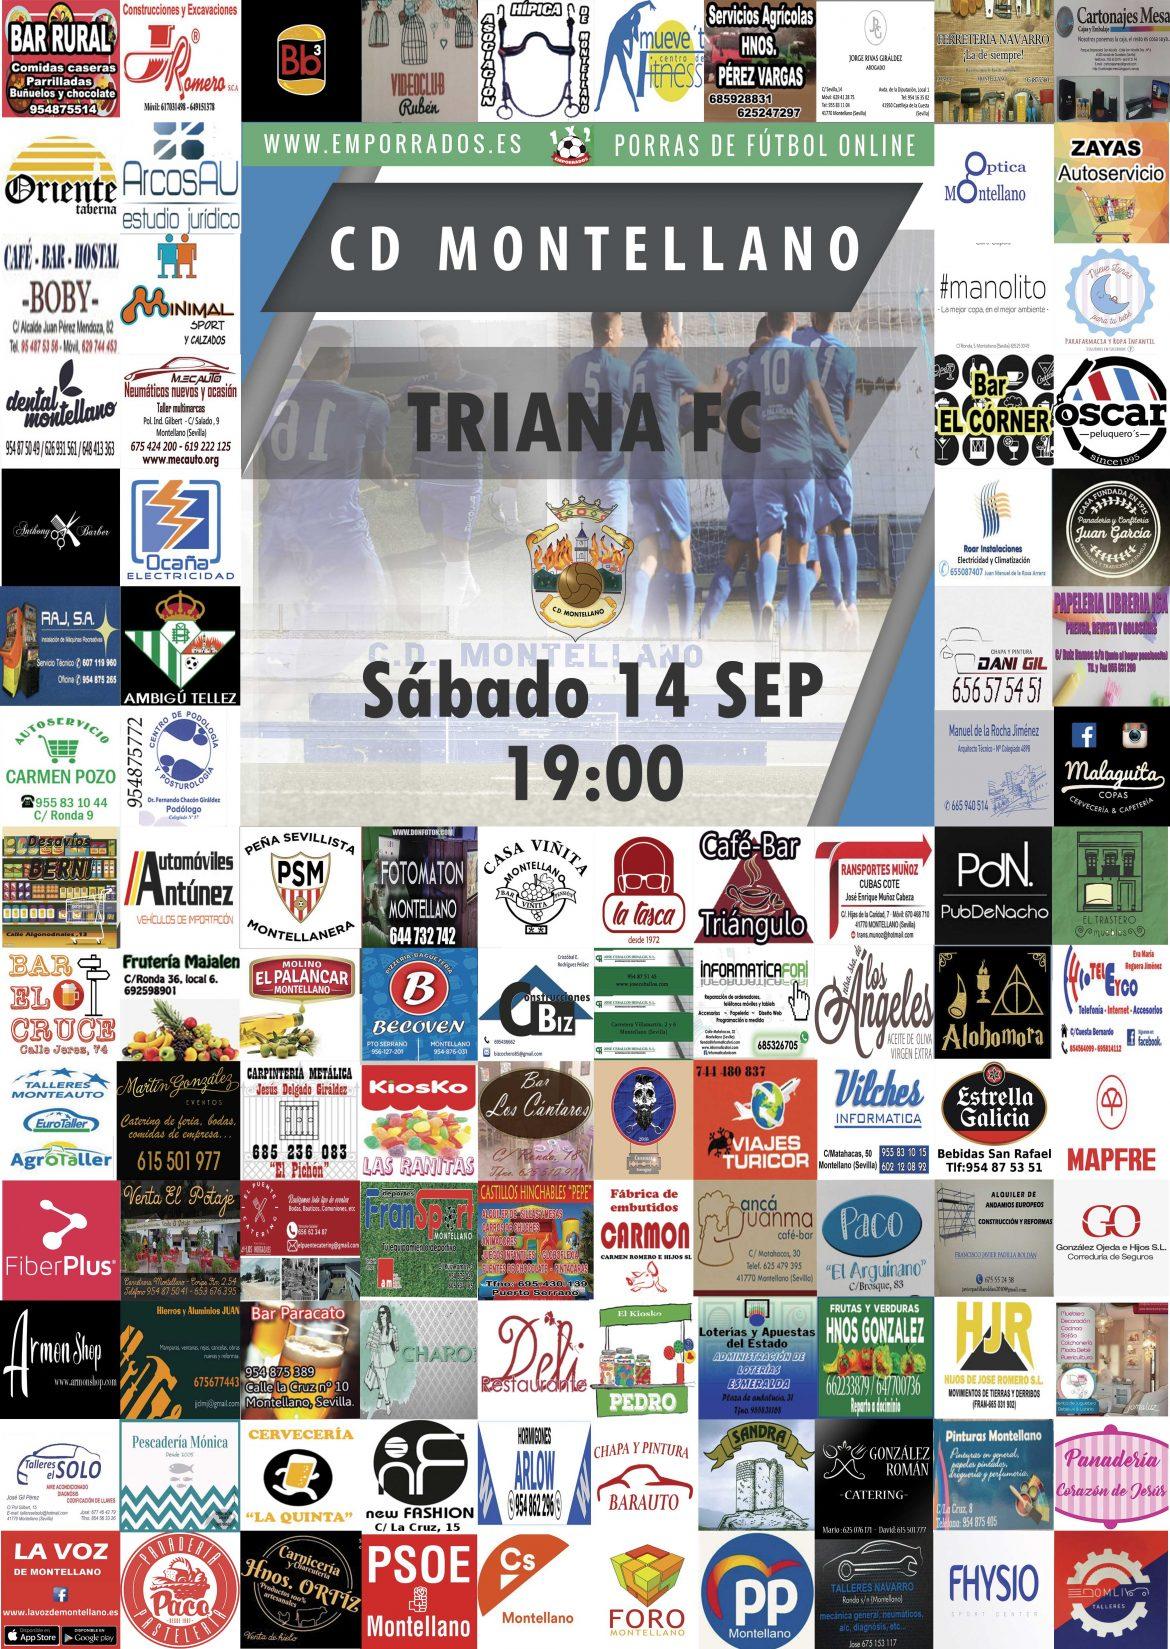 montellano-vs-triana 2019